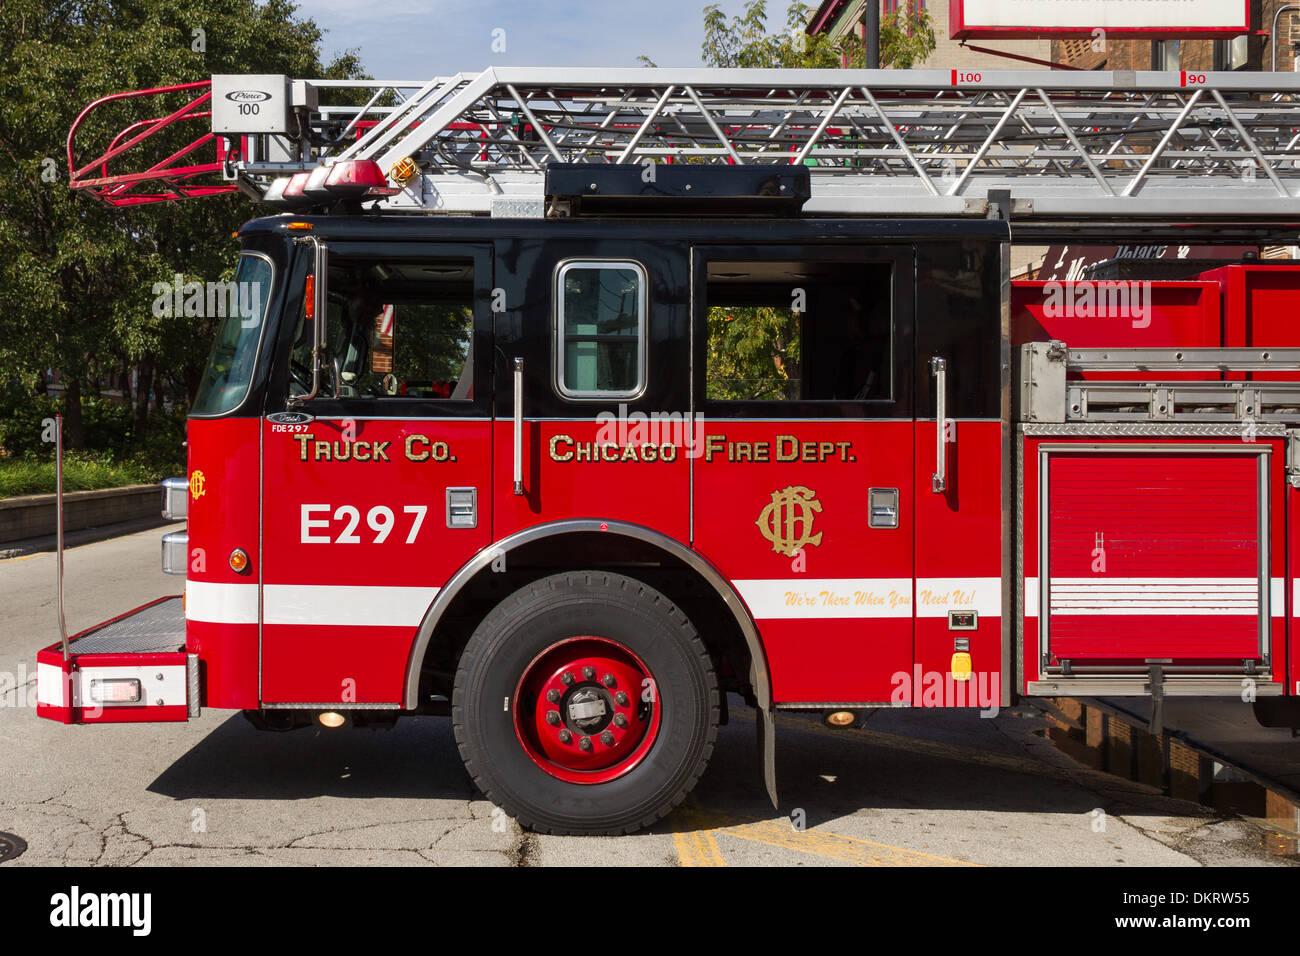 Chicago E297 Fire truck fire dept fire engine - Stock Image